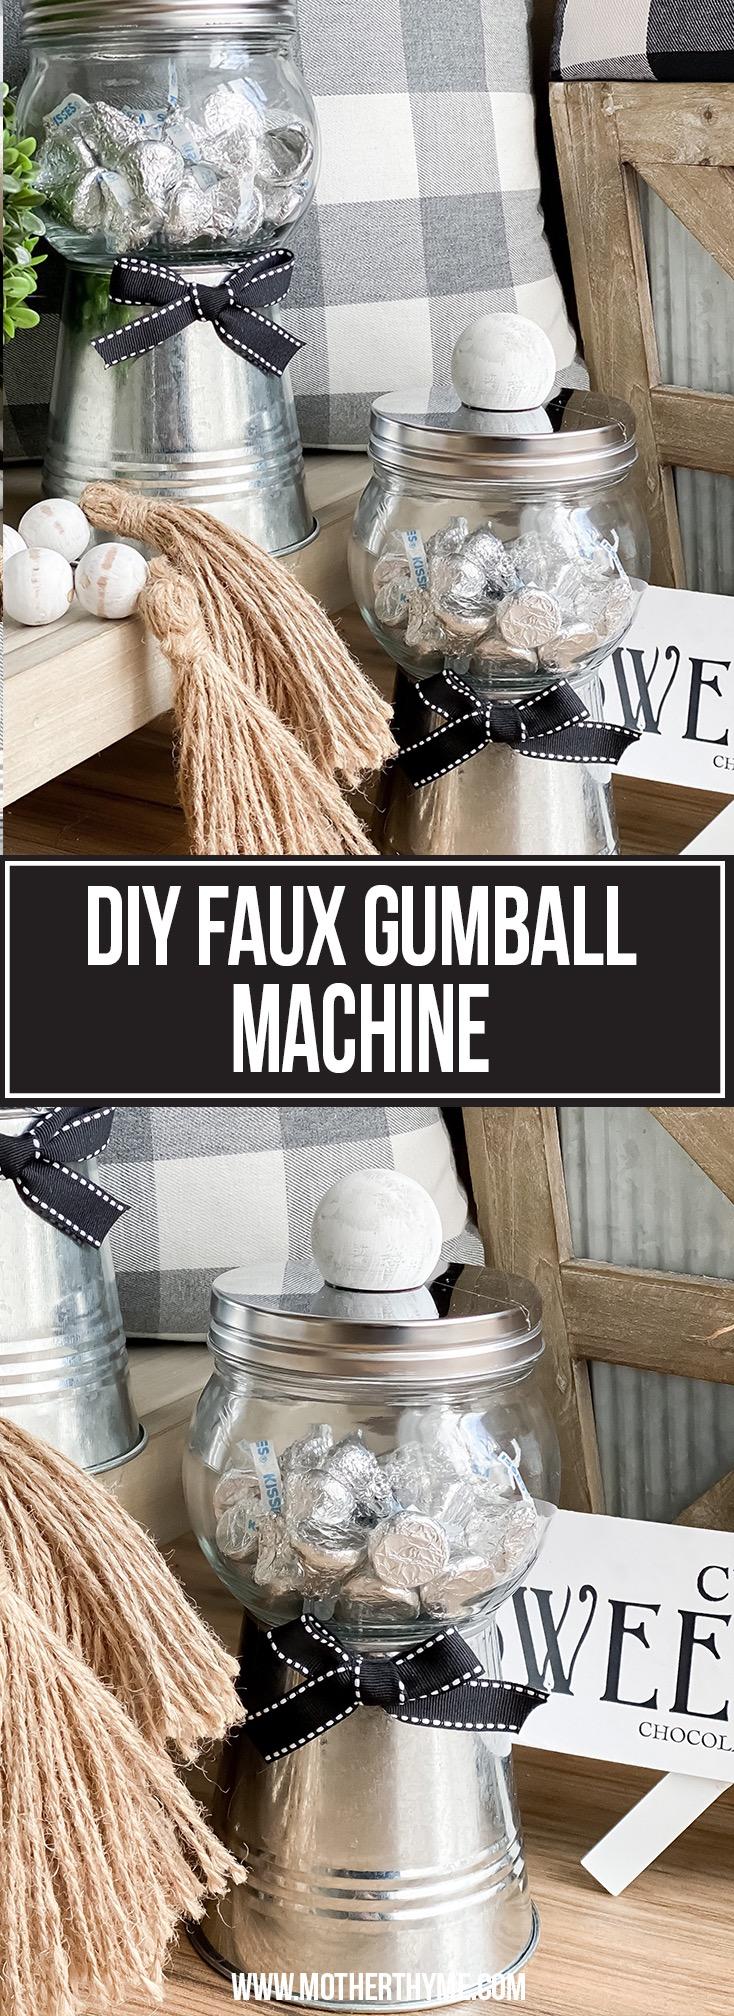 DIY FAUX GUMBALL MACHINE